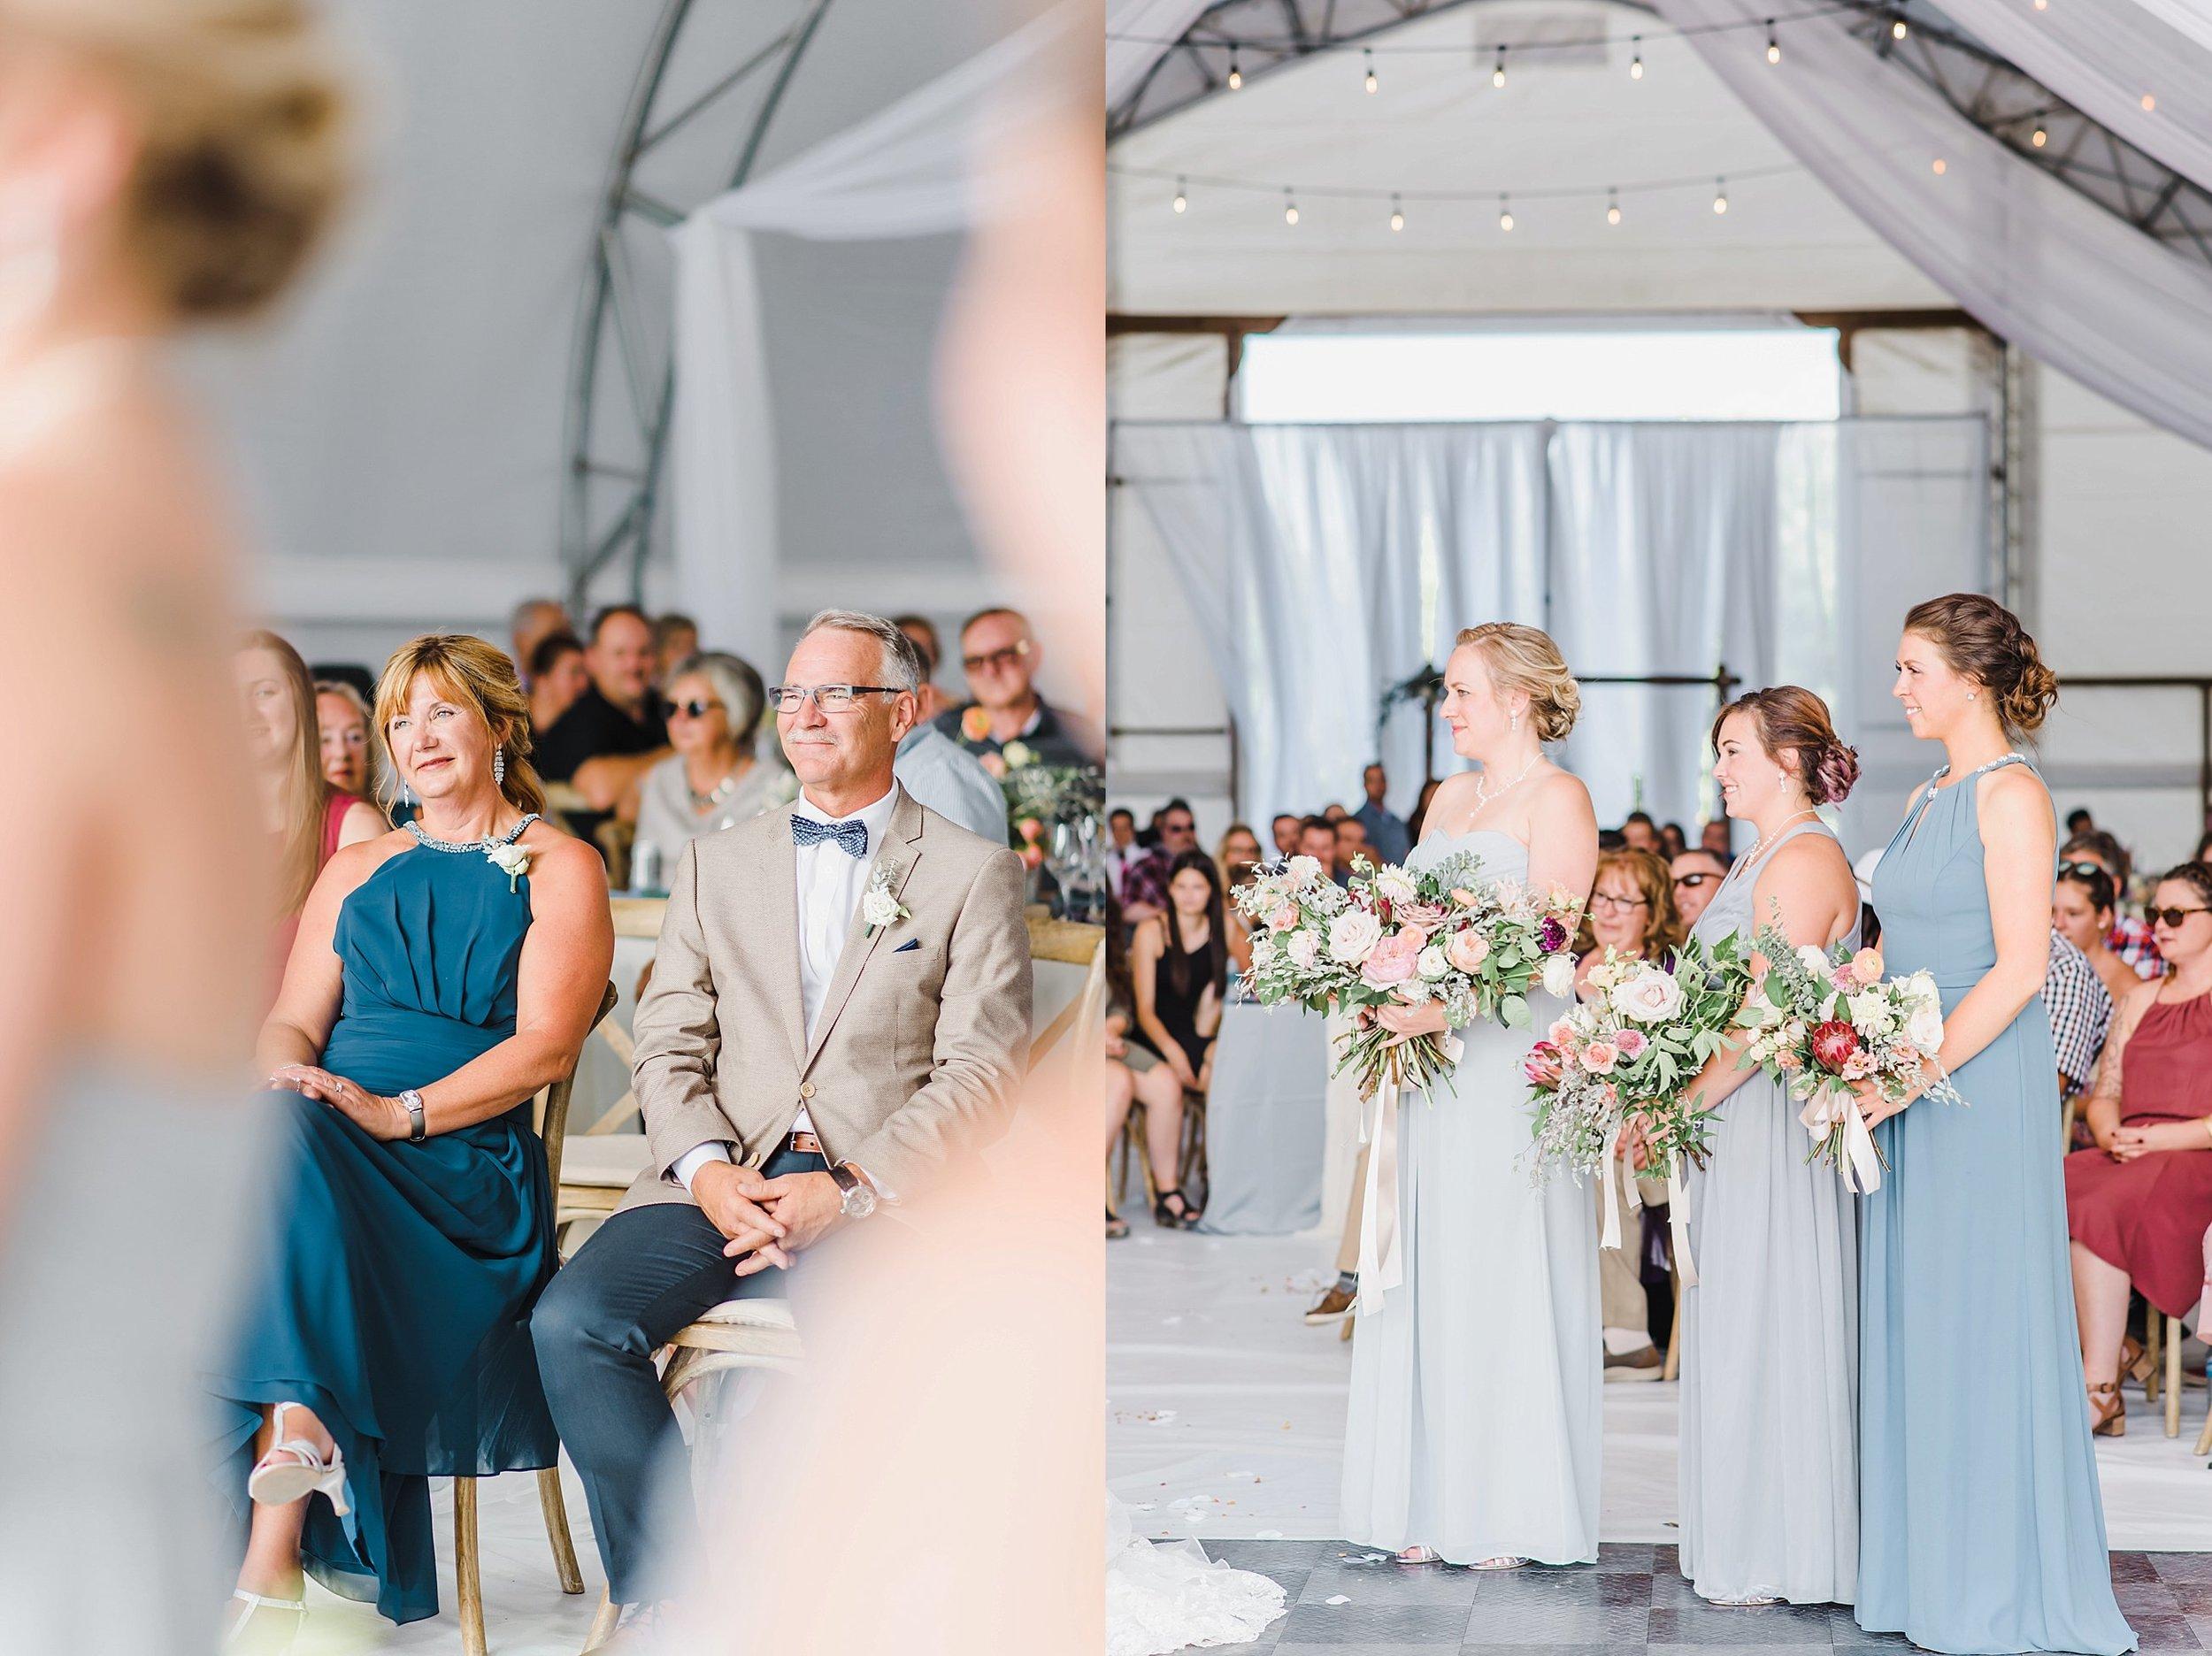 light airy indie fine art ottawa wedding photographer | Ali and Batoul Photography_0368.jpg